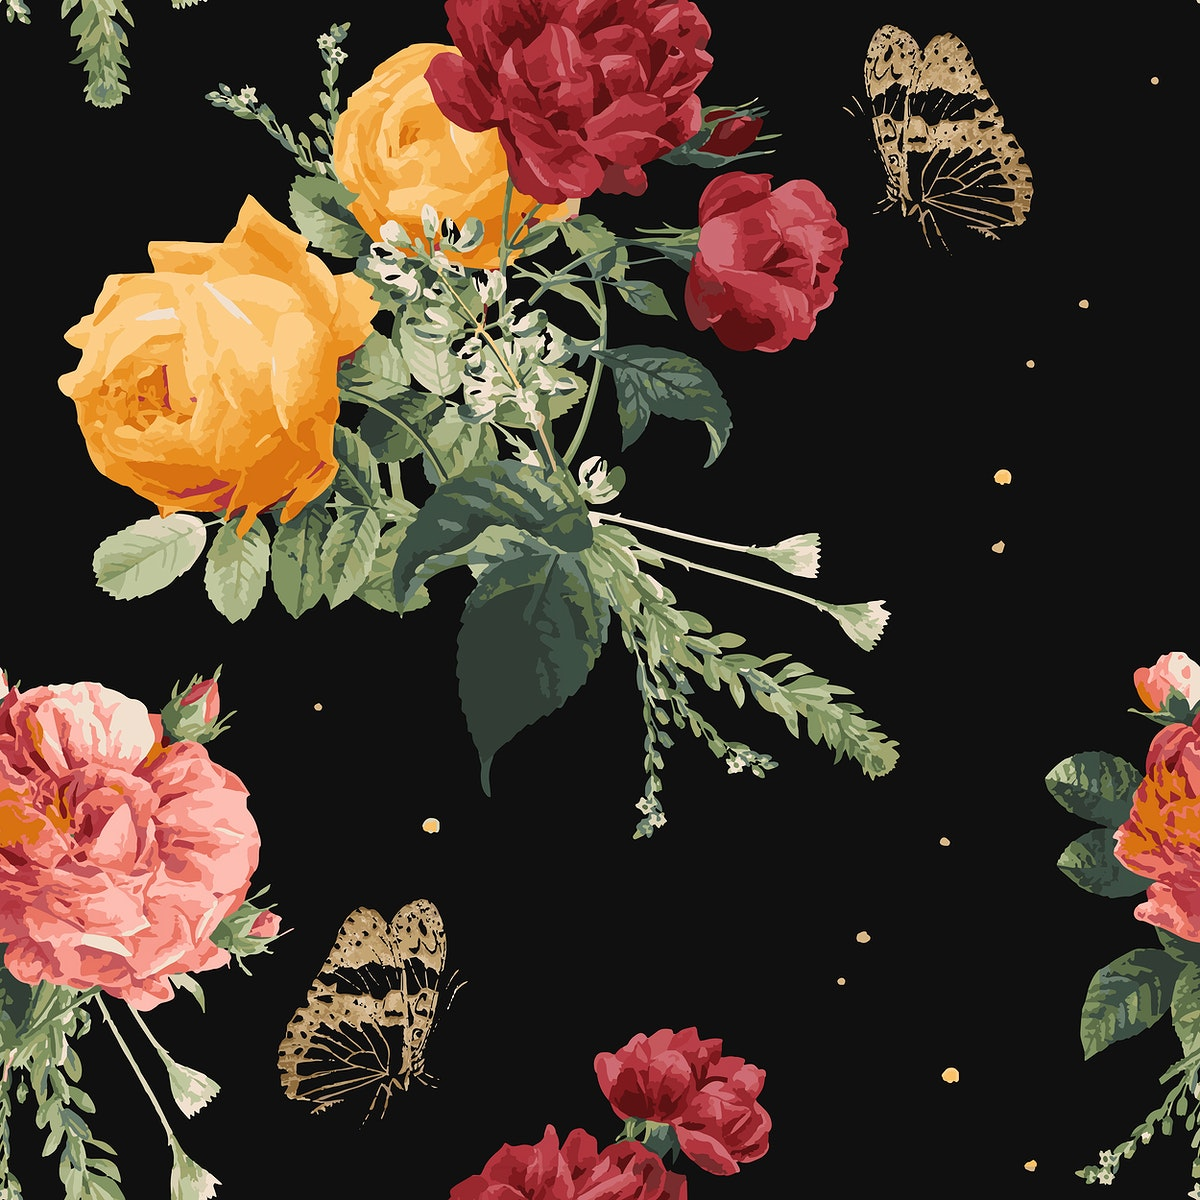 Vintage colorful roses pattern vector background